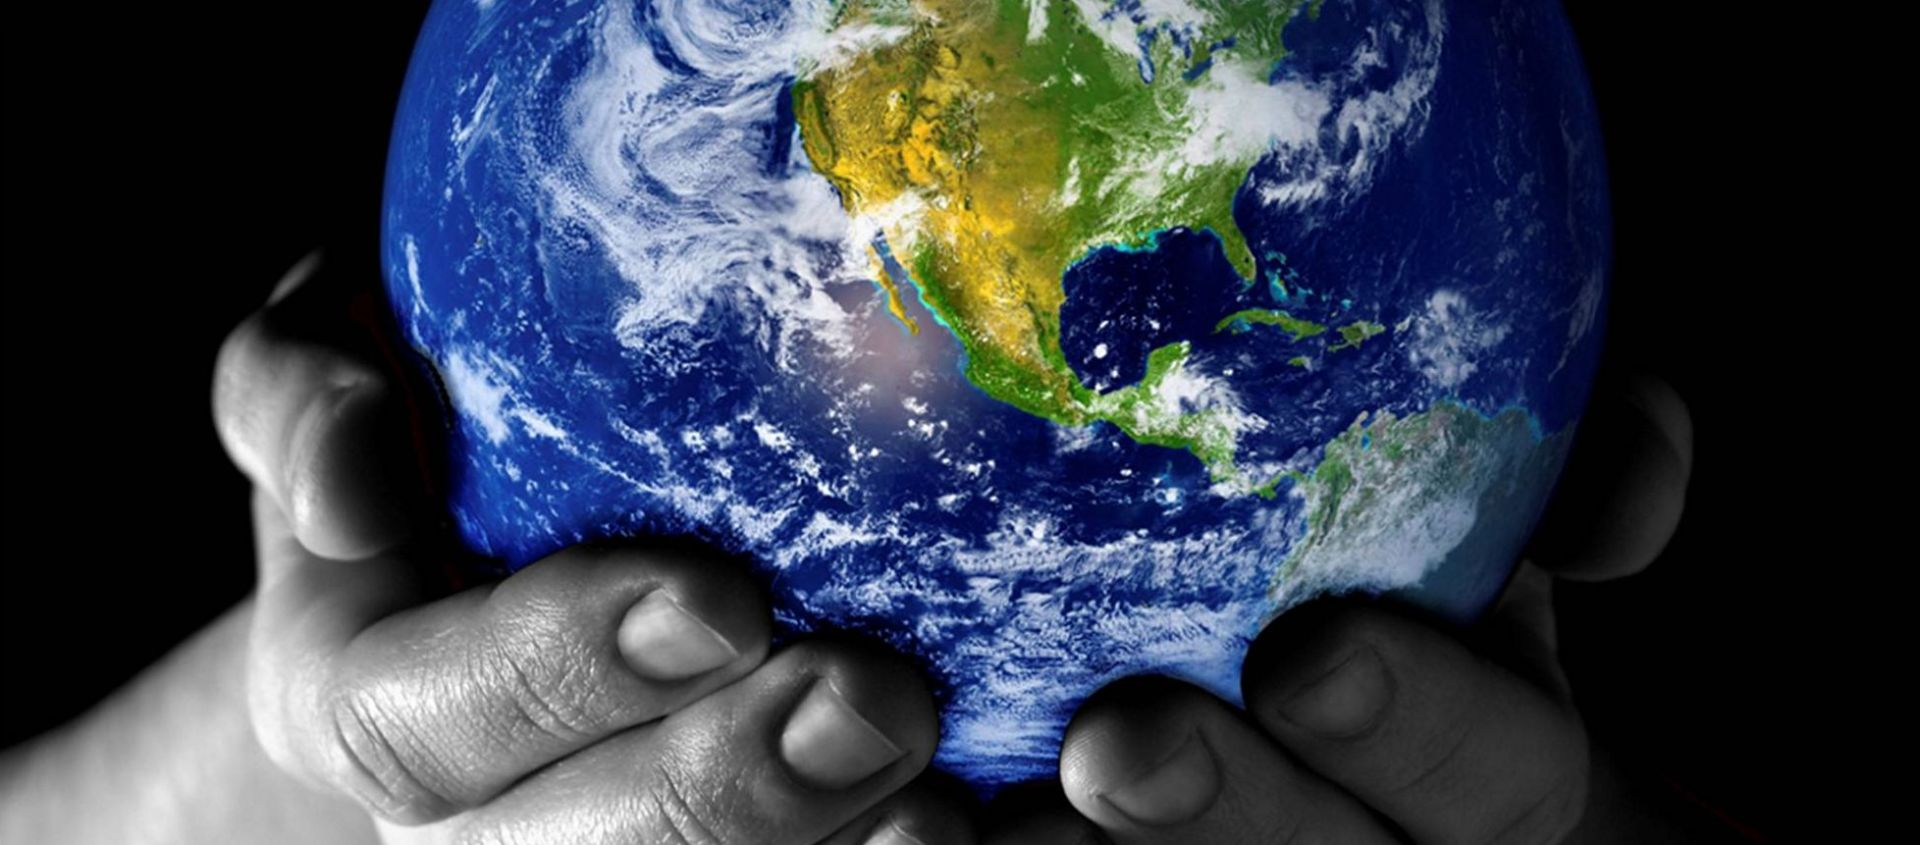 world-in-black-and-white-hands-1-var1